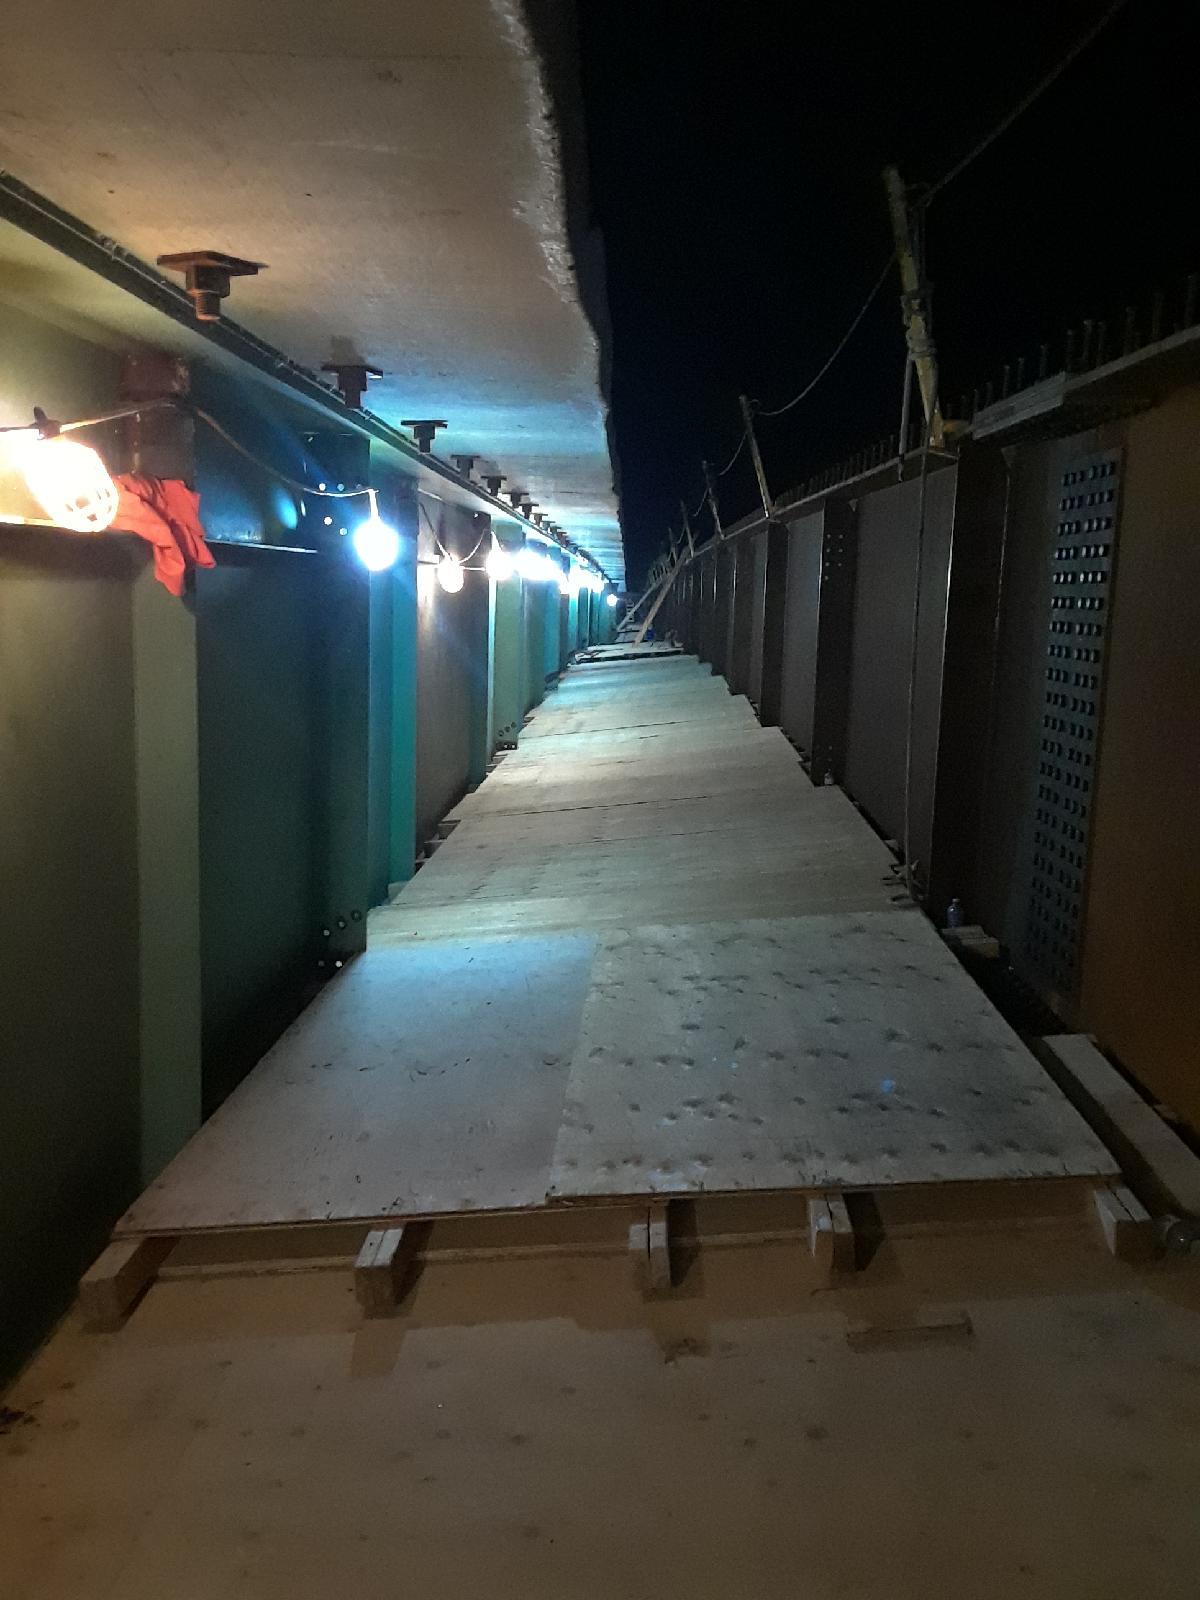 Night work - access platform